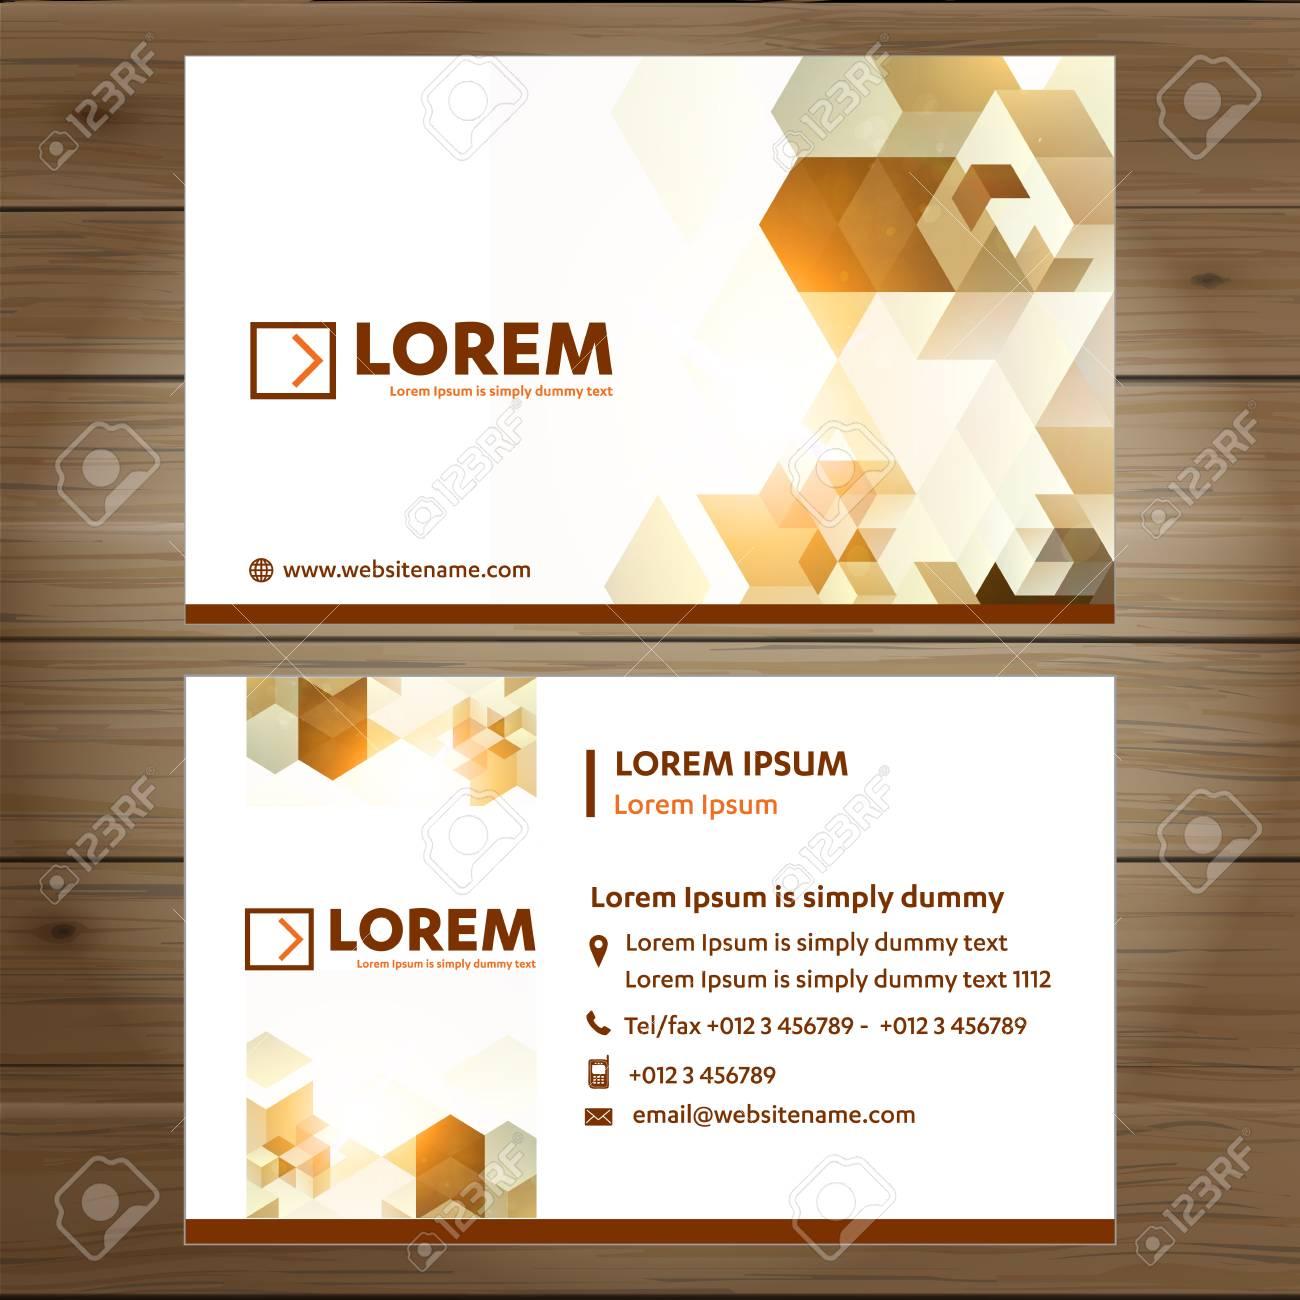 Business Card Vector Template, Tech Logo Link Network, Visiting ...